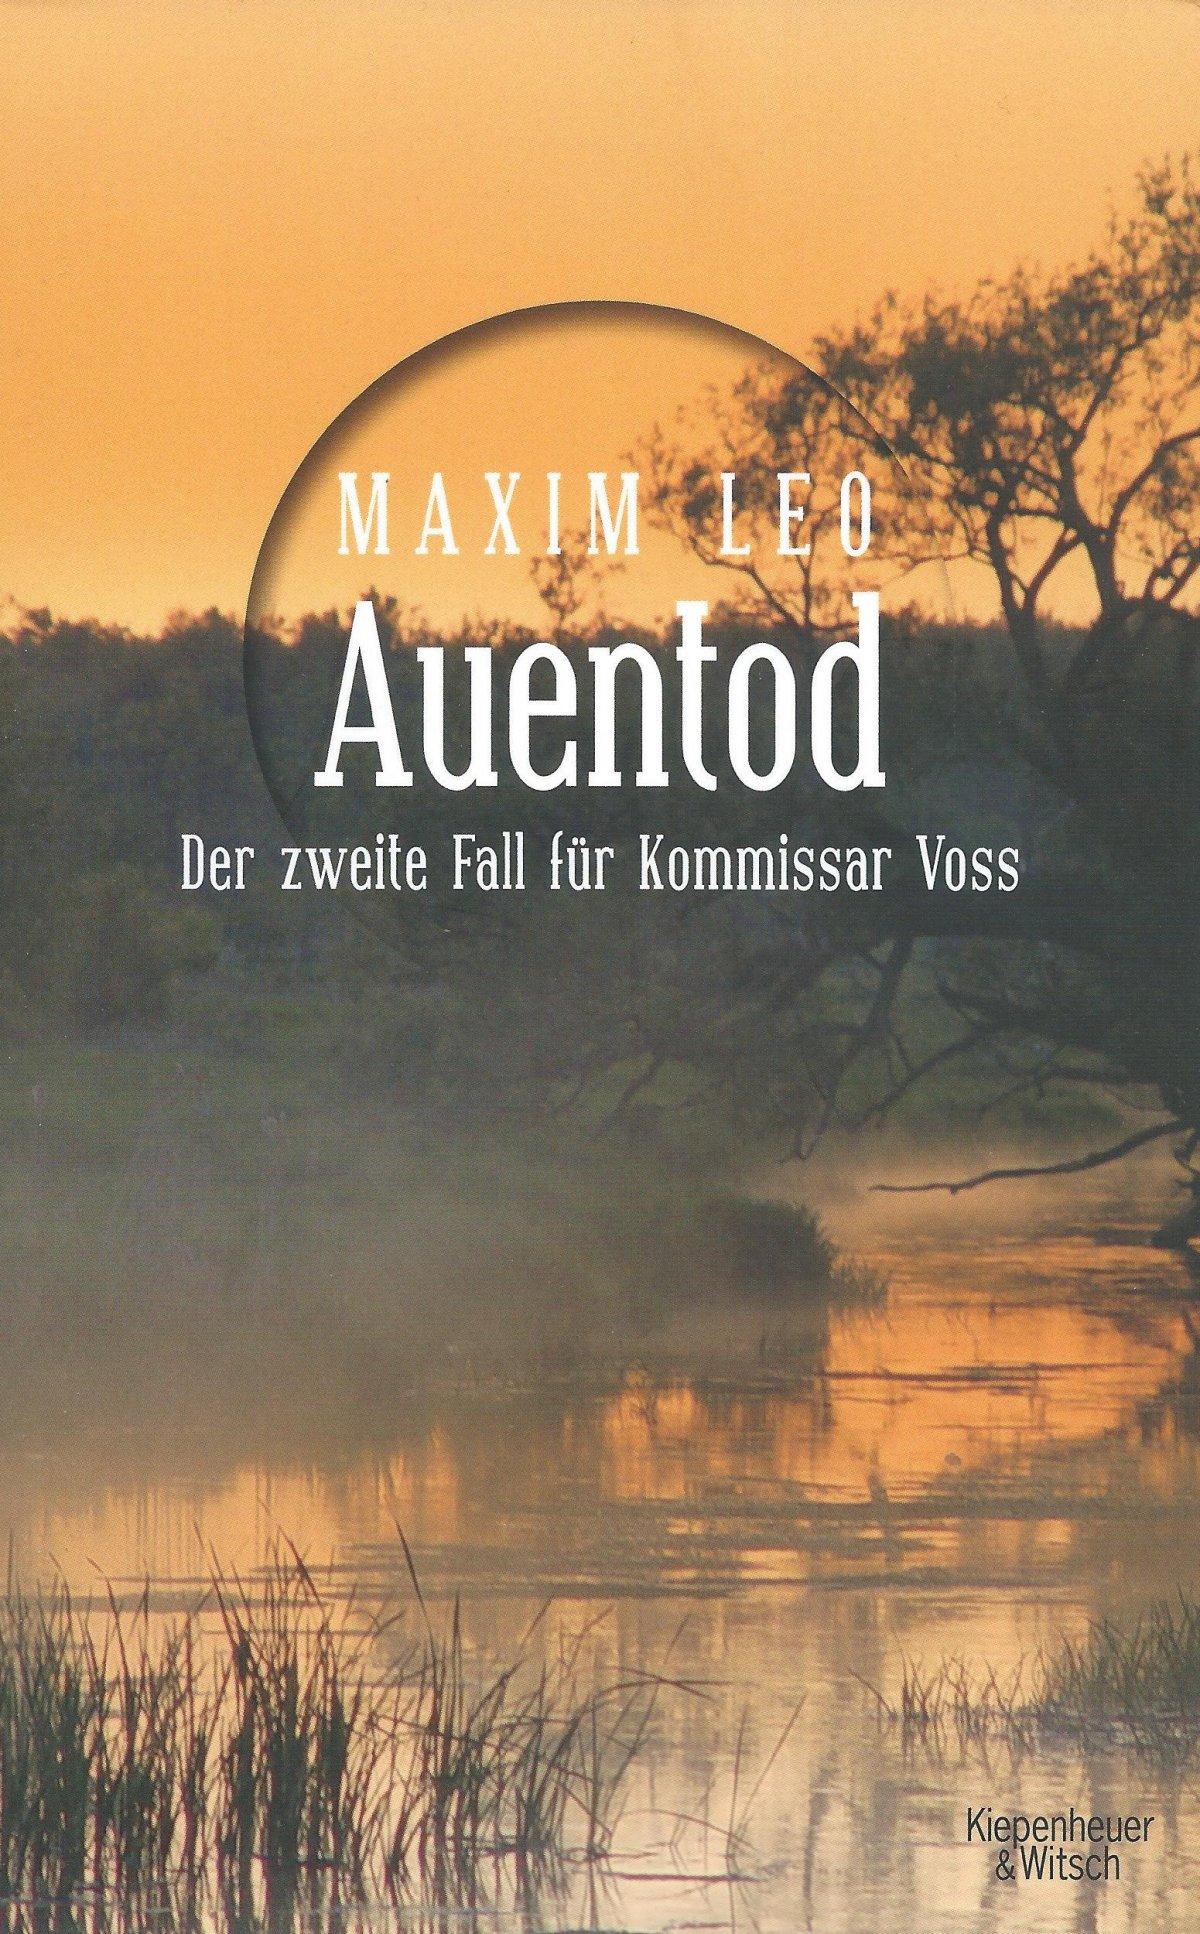 Maxim Leo schickt Kommissar Voss zum Auentod